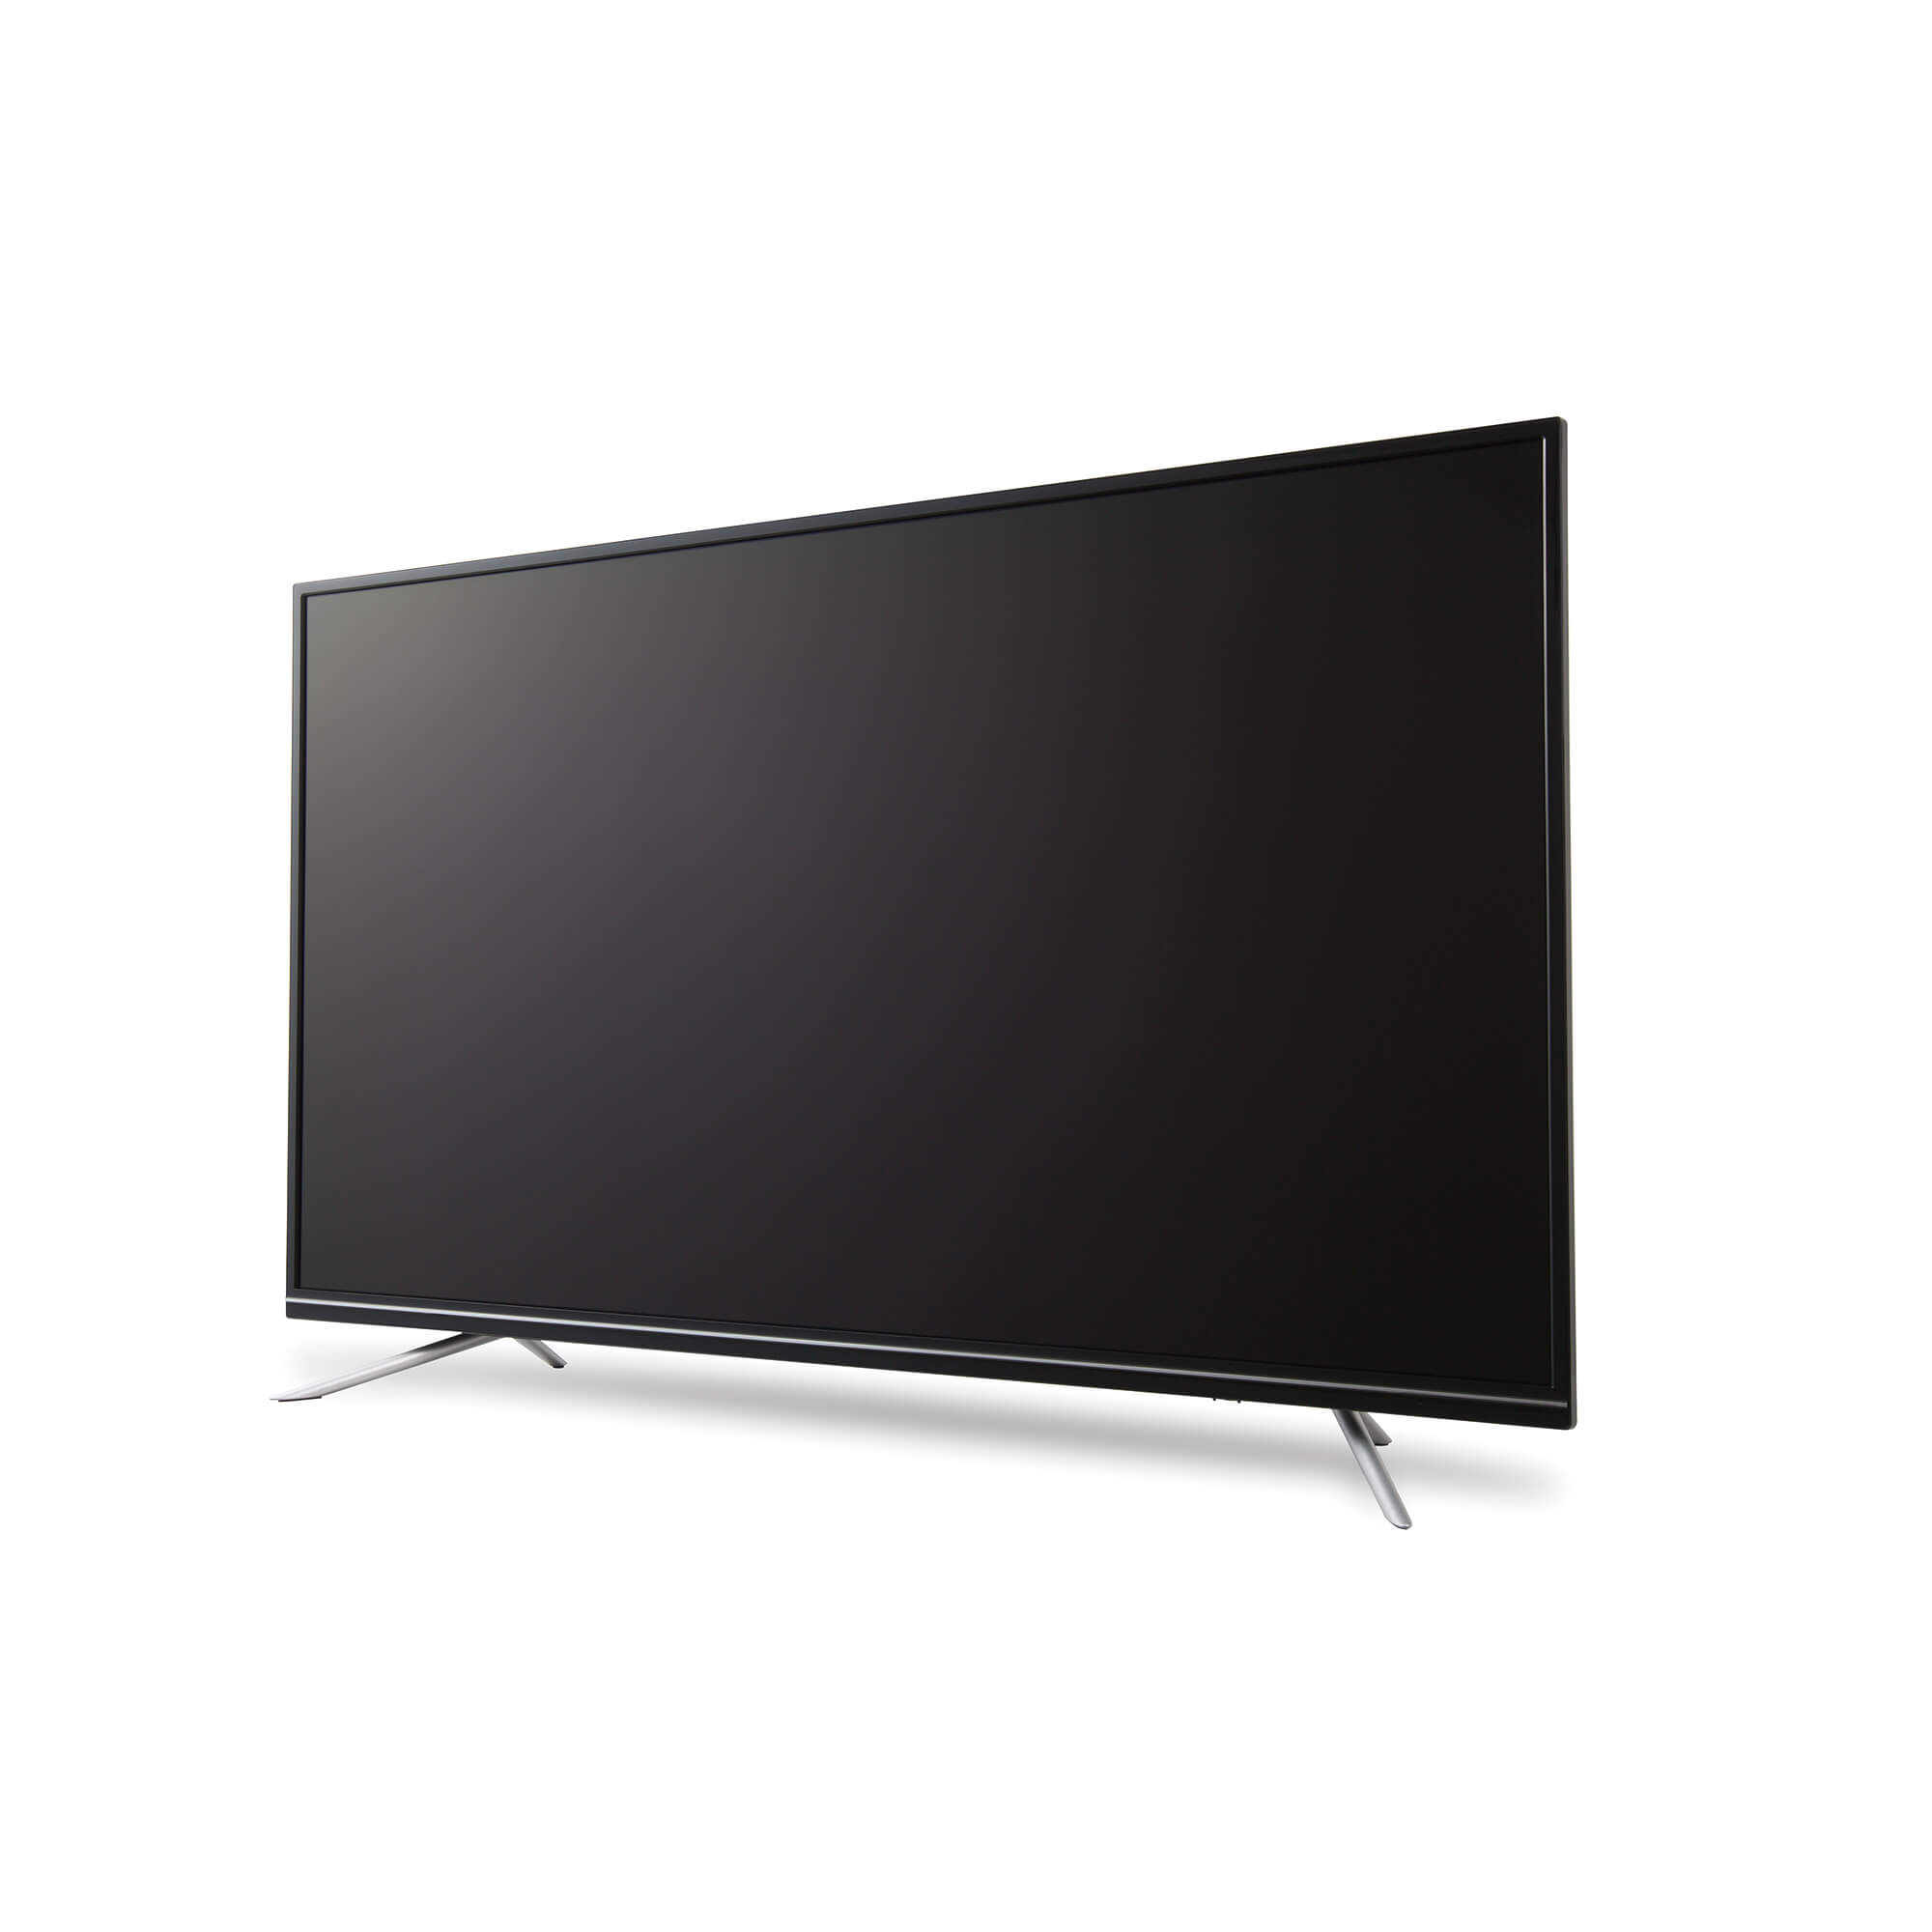 GH-TV49D-BK